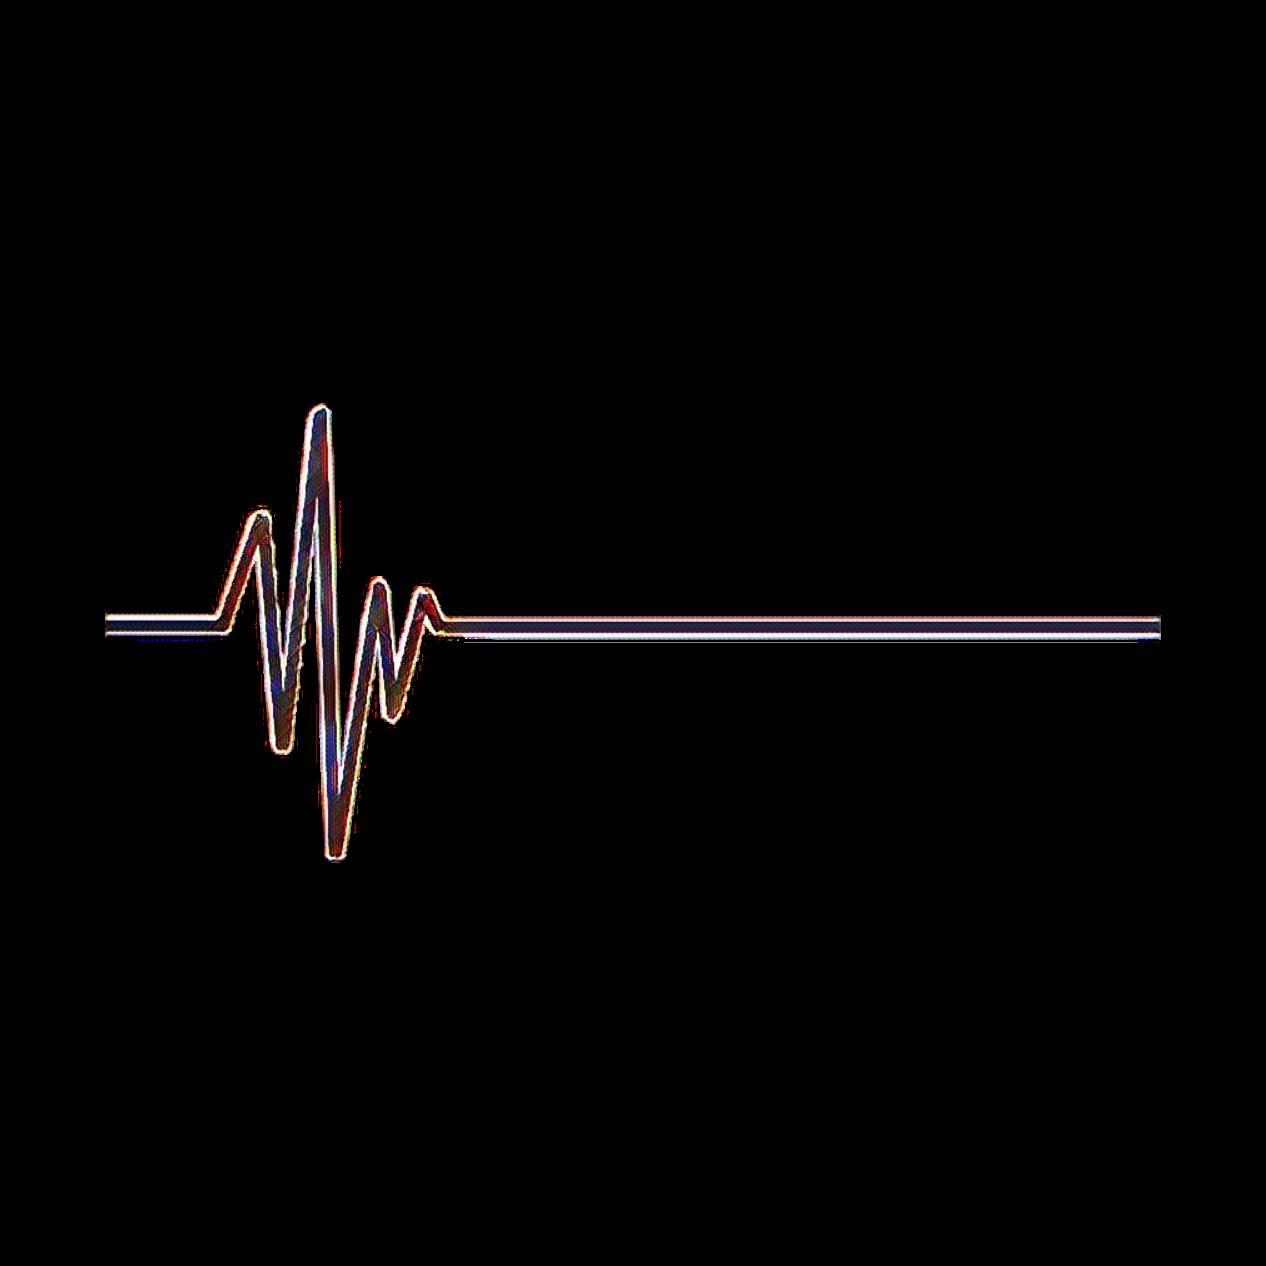 Heartbeat Line Drawing: Heartbeat Line Stickers Decoration